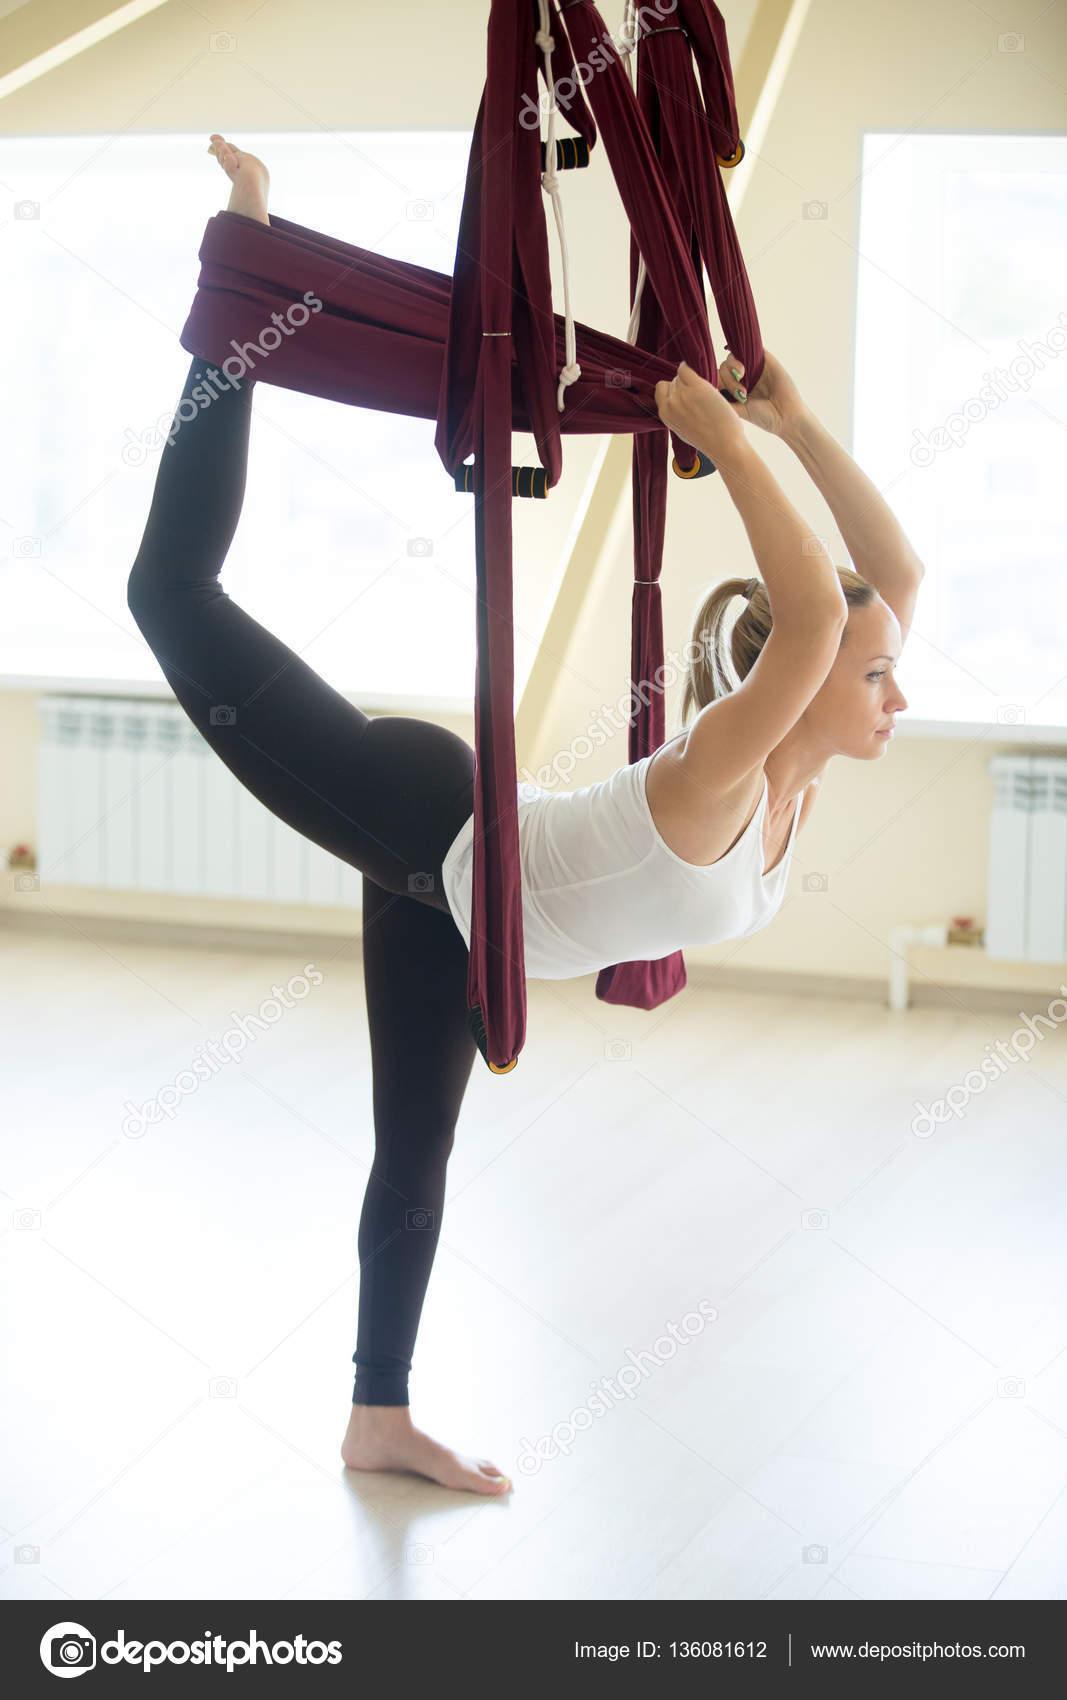 Schone Frau Tun Natarajasana Yoga Pose In Hangematte Stockfoto